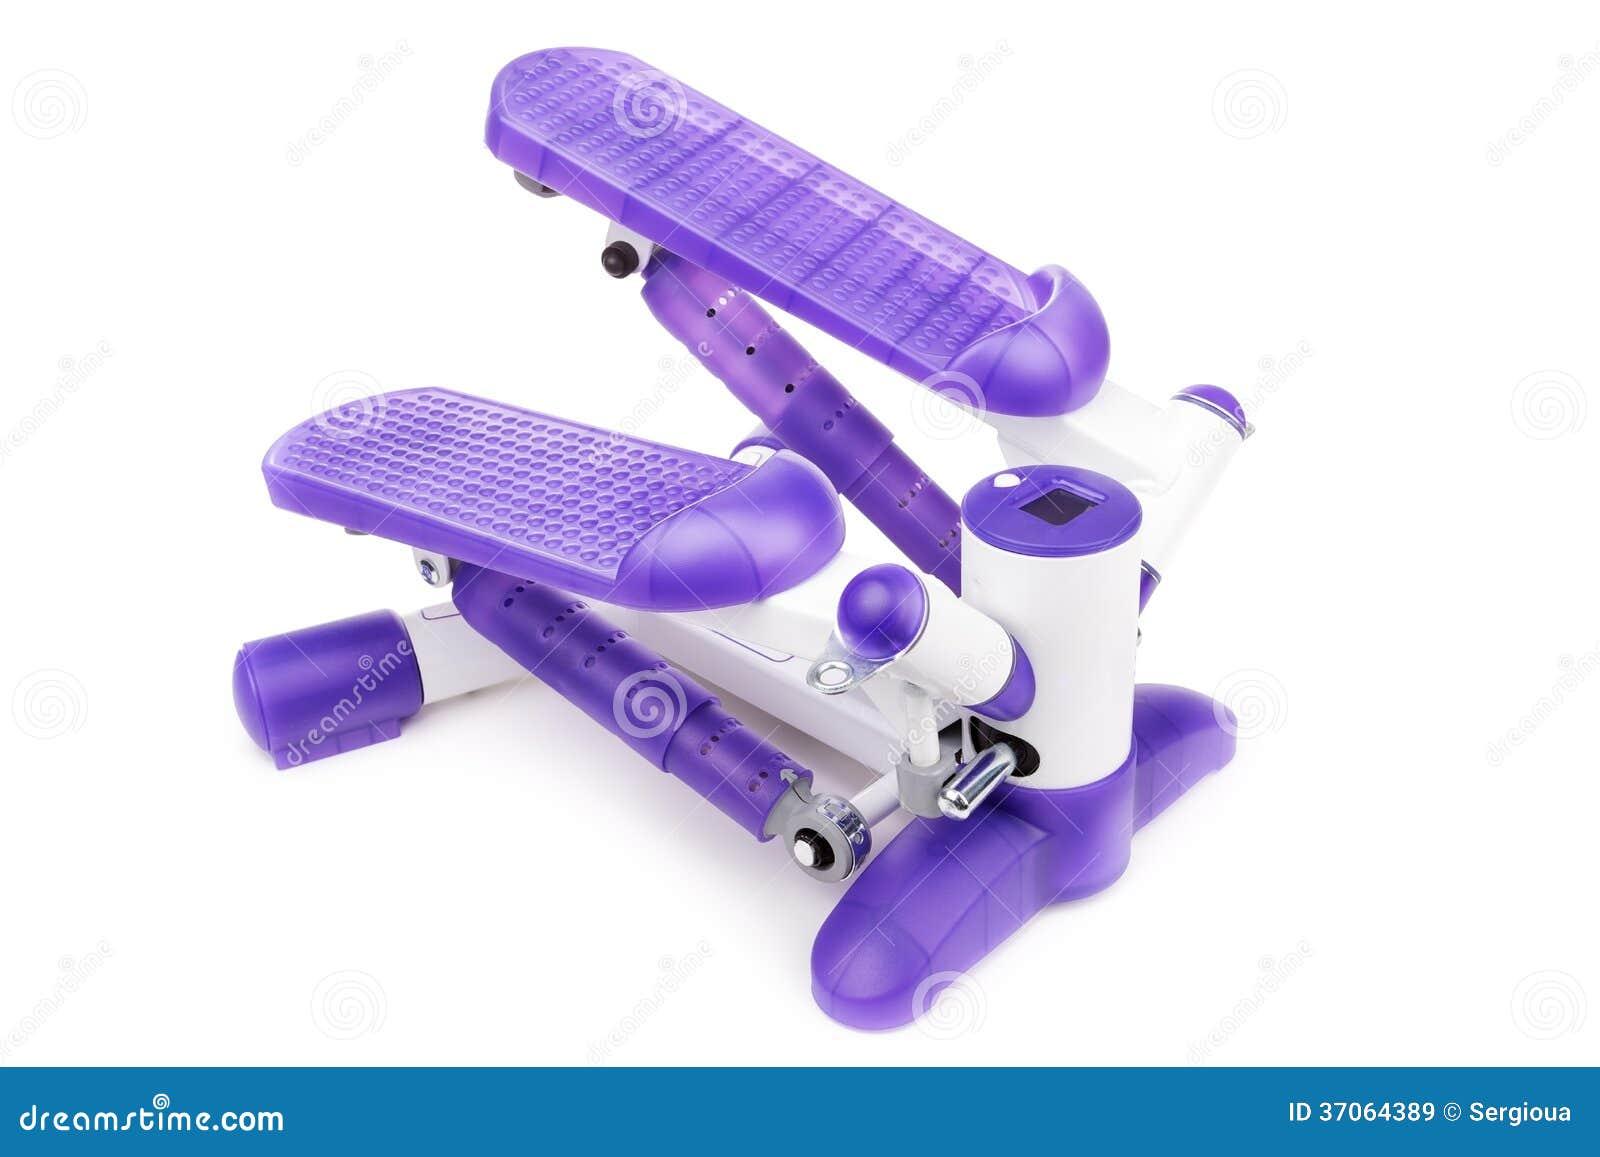 stair walker exercise machine